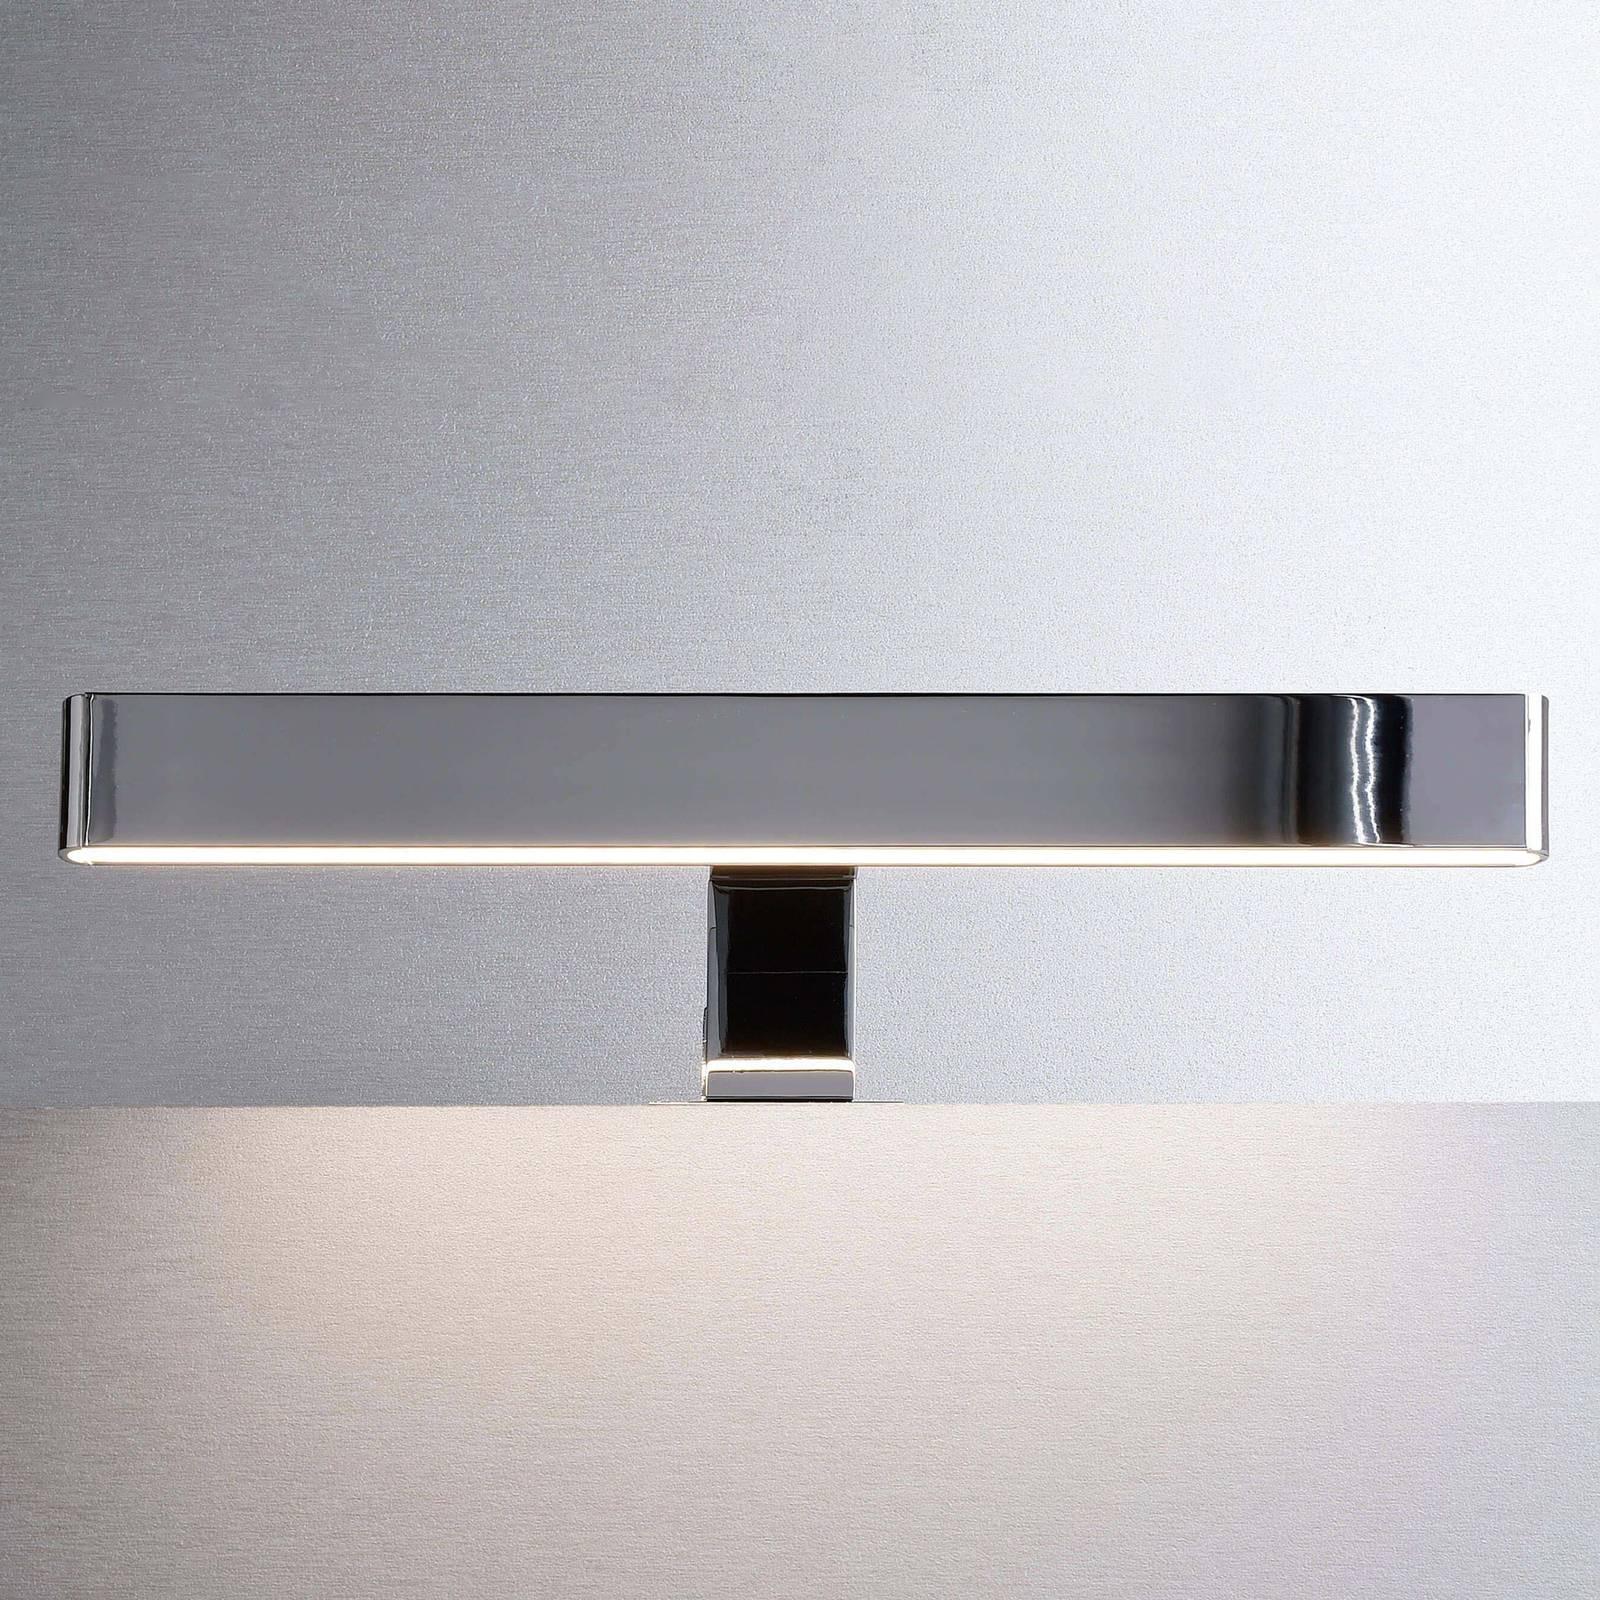 LED-kalustevalaisin Spiegel Line, 2 kpl, 8 W 31cm